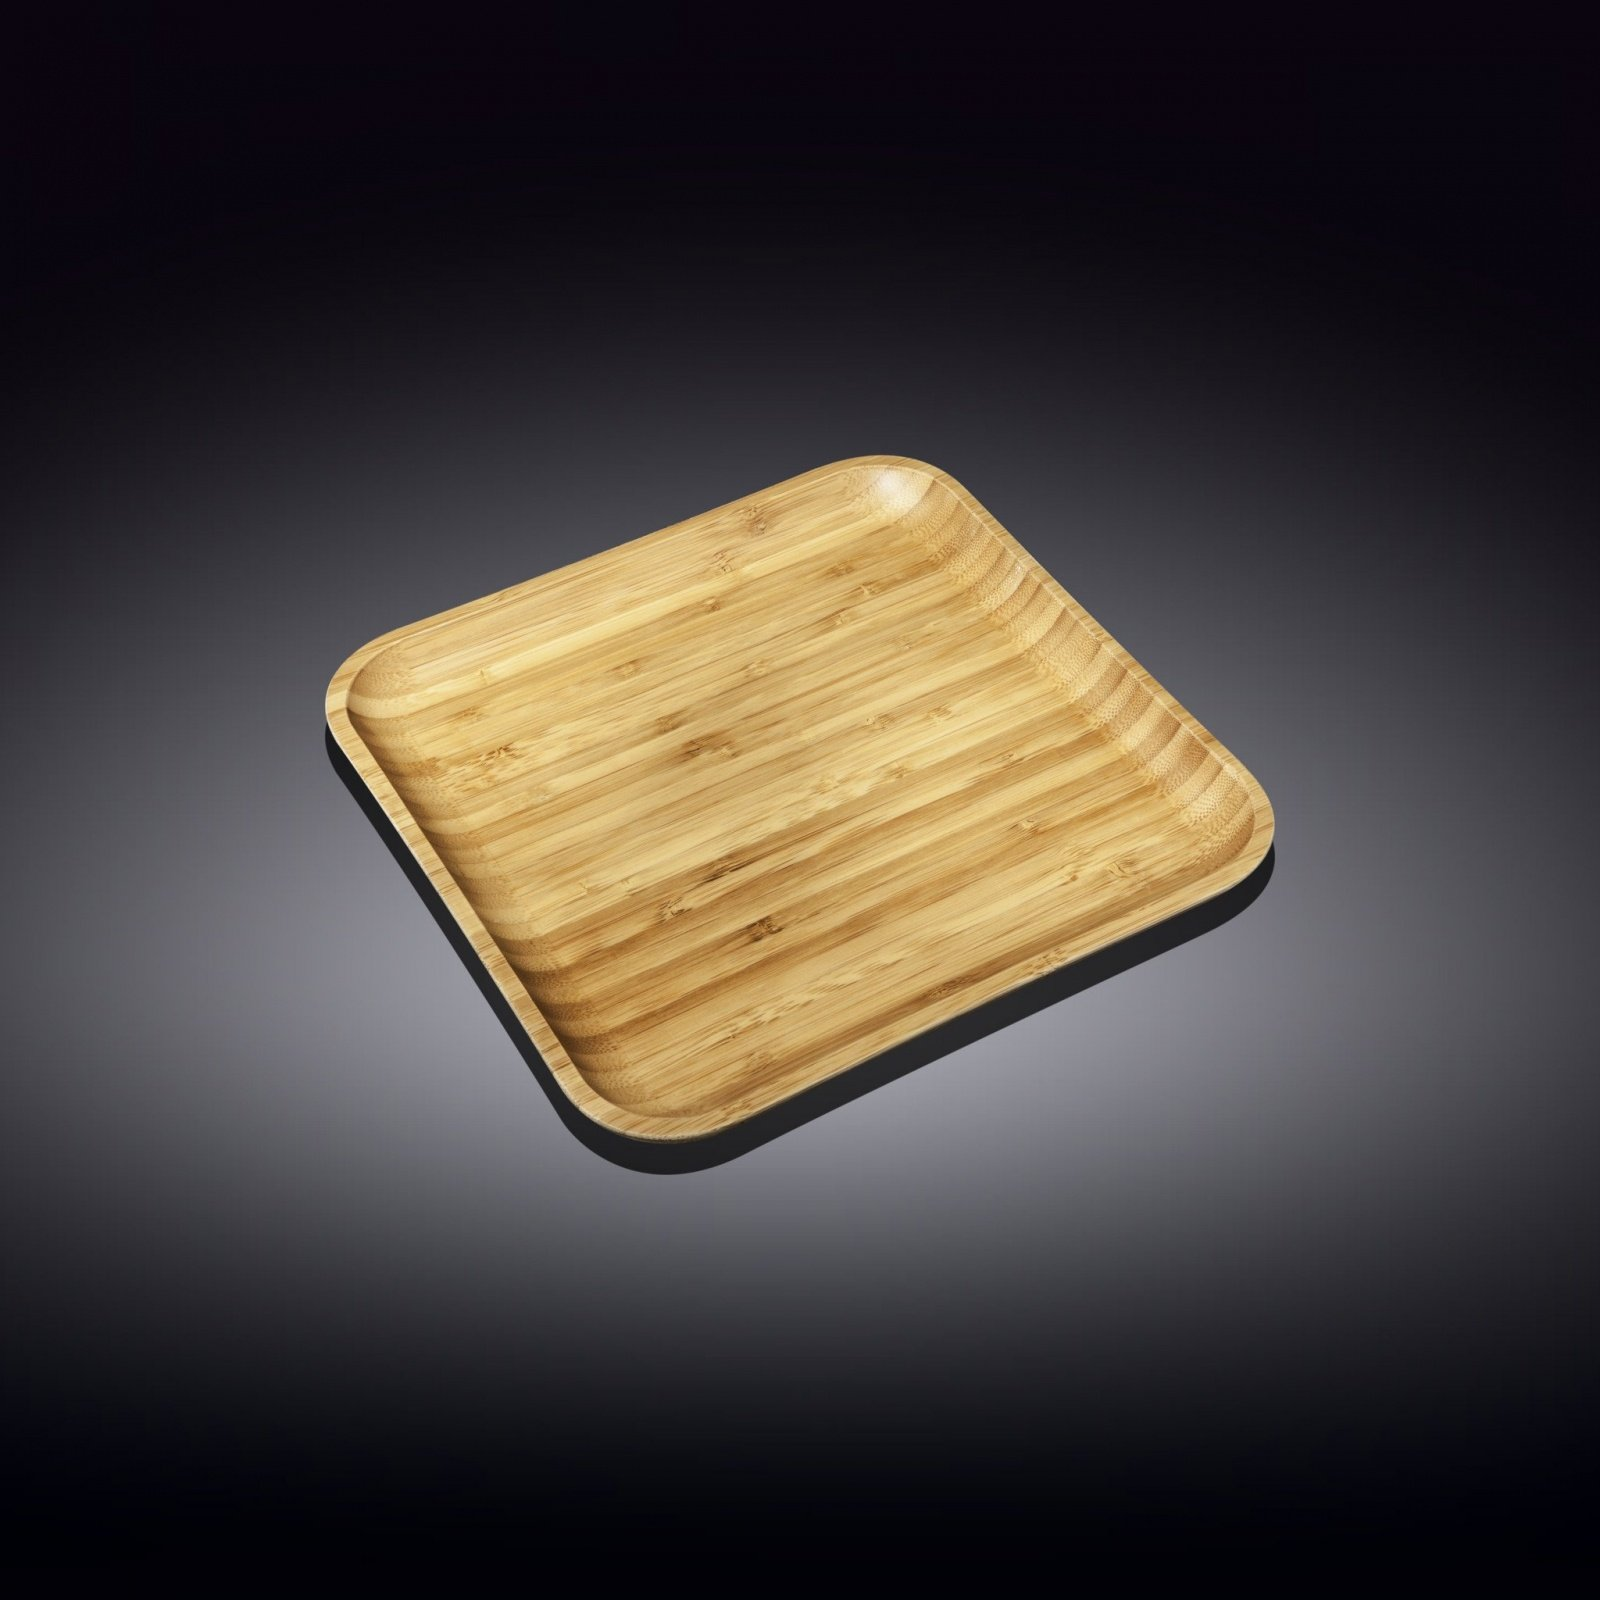 Тарелка бамбуковая Wilmax сервировочная квадратная 17,5 x 17,5 см